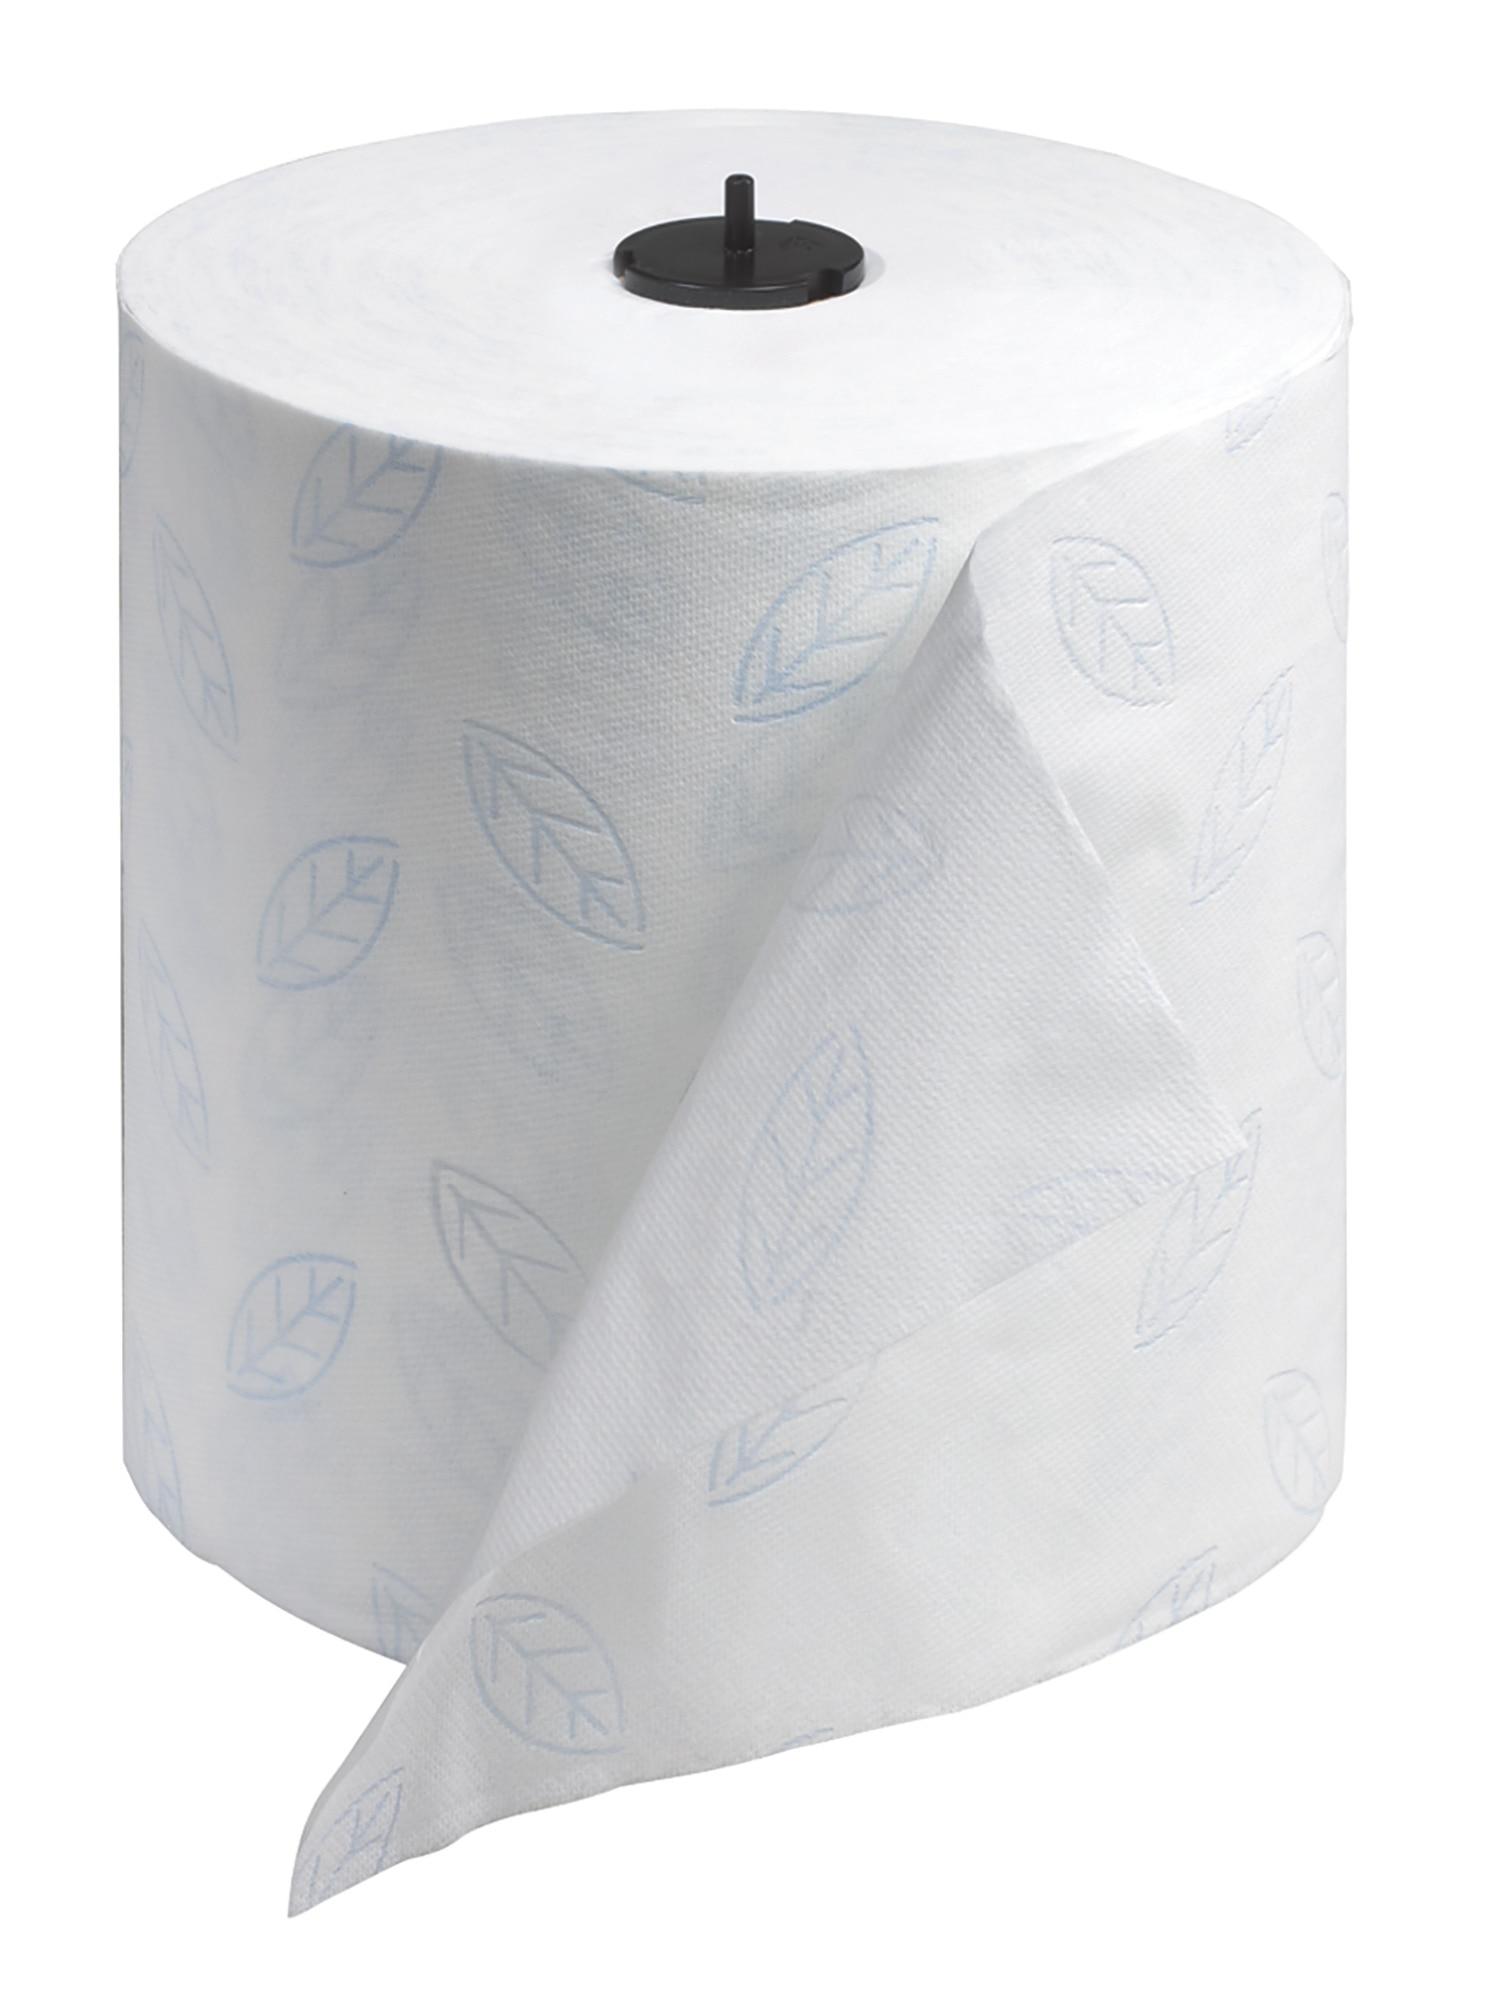 6 per case Tork® Universal White Hand Towel Roll